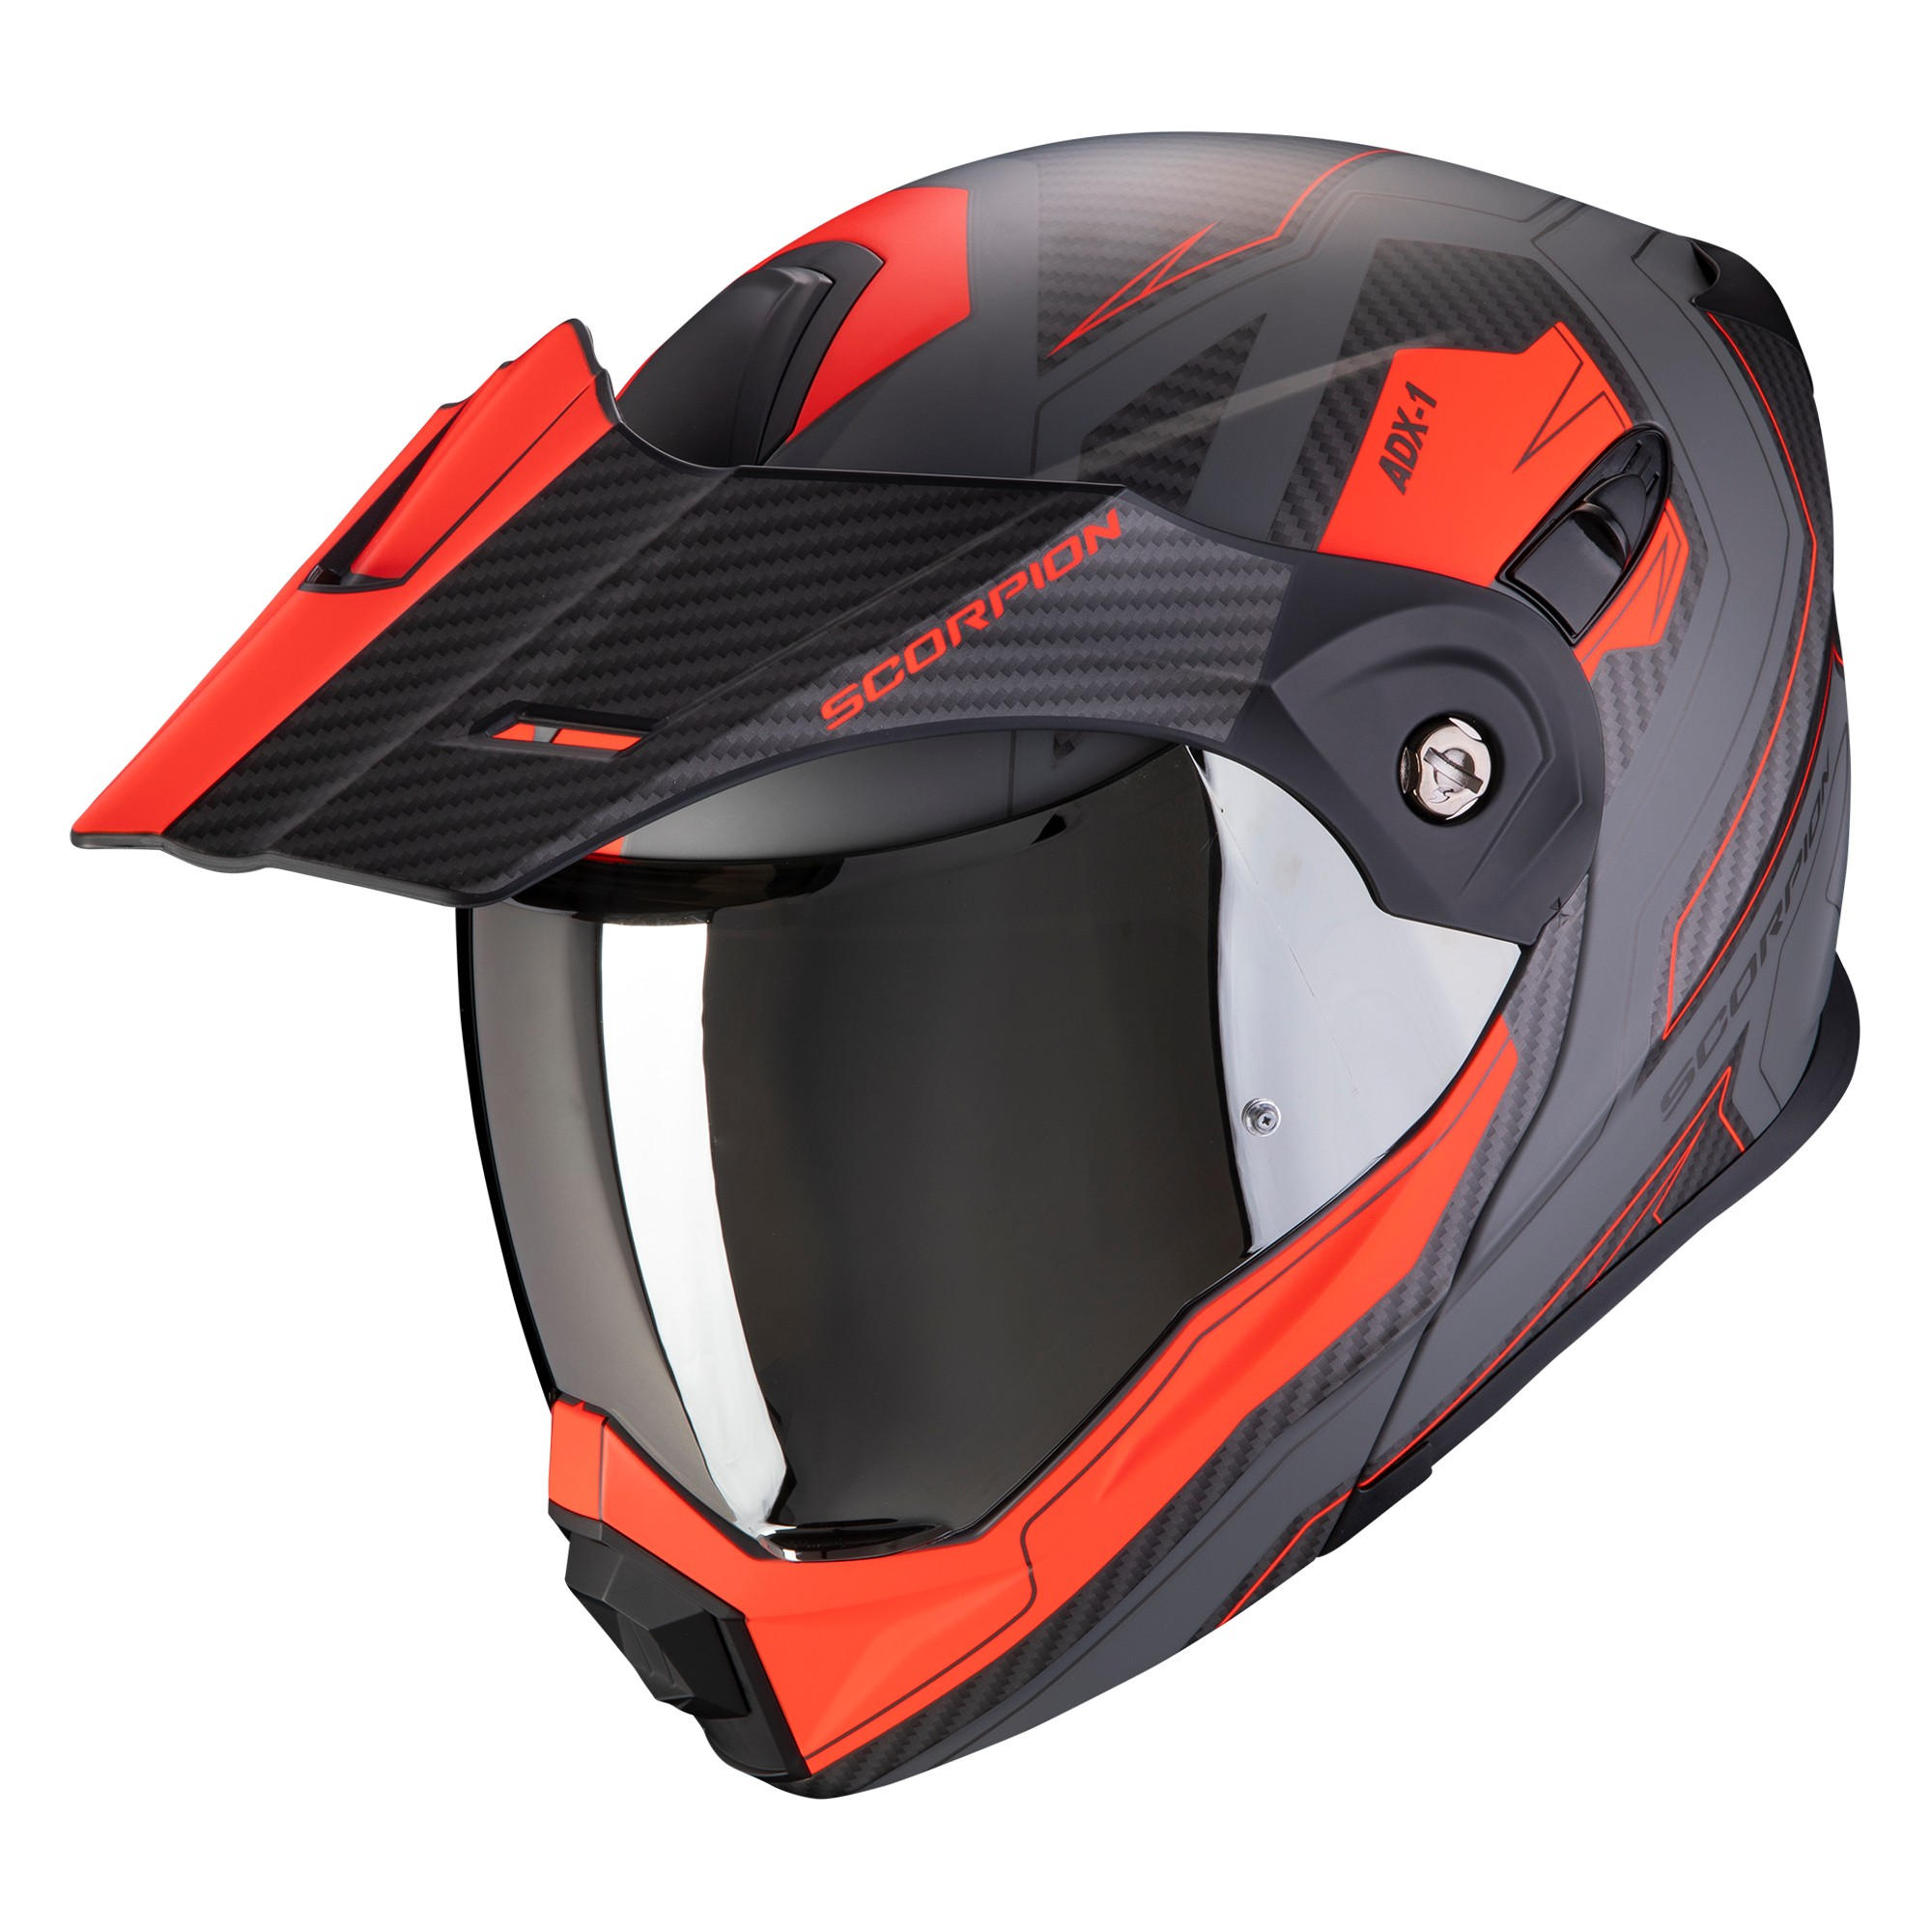 Scorpion casco moto adx-1 battleflage sabbia-grigio xxl